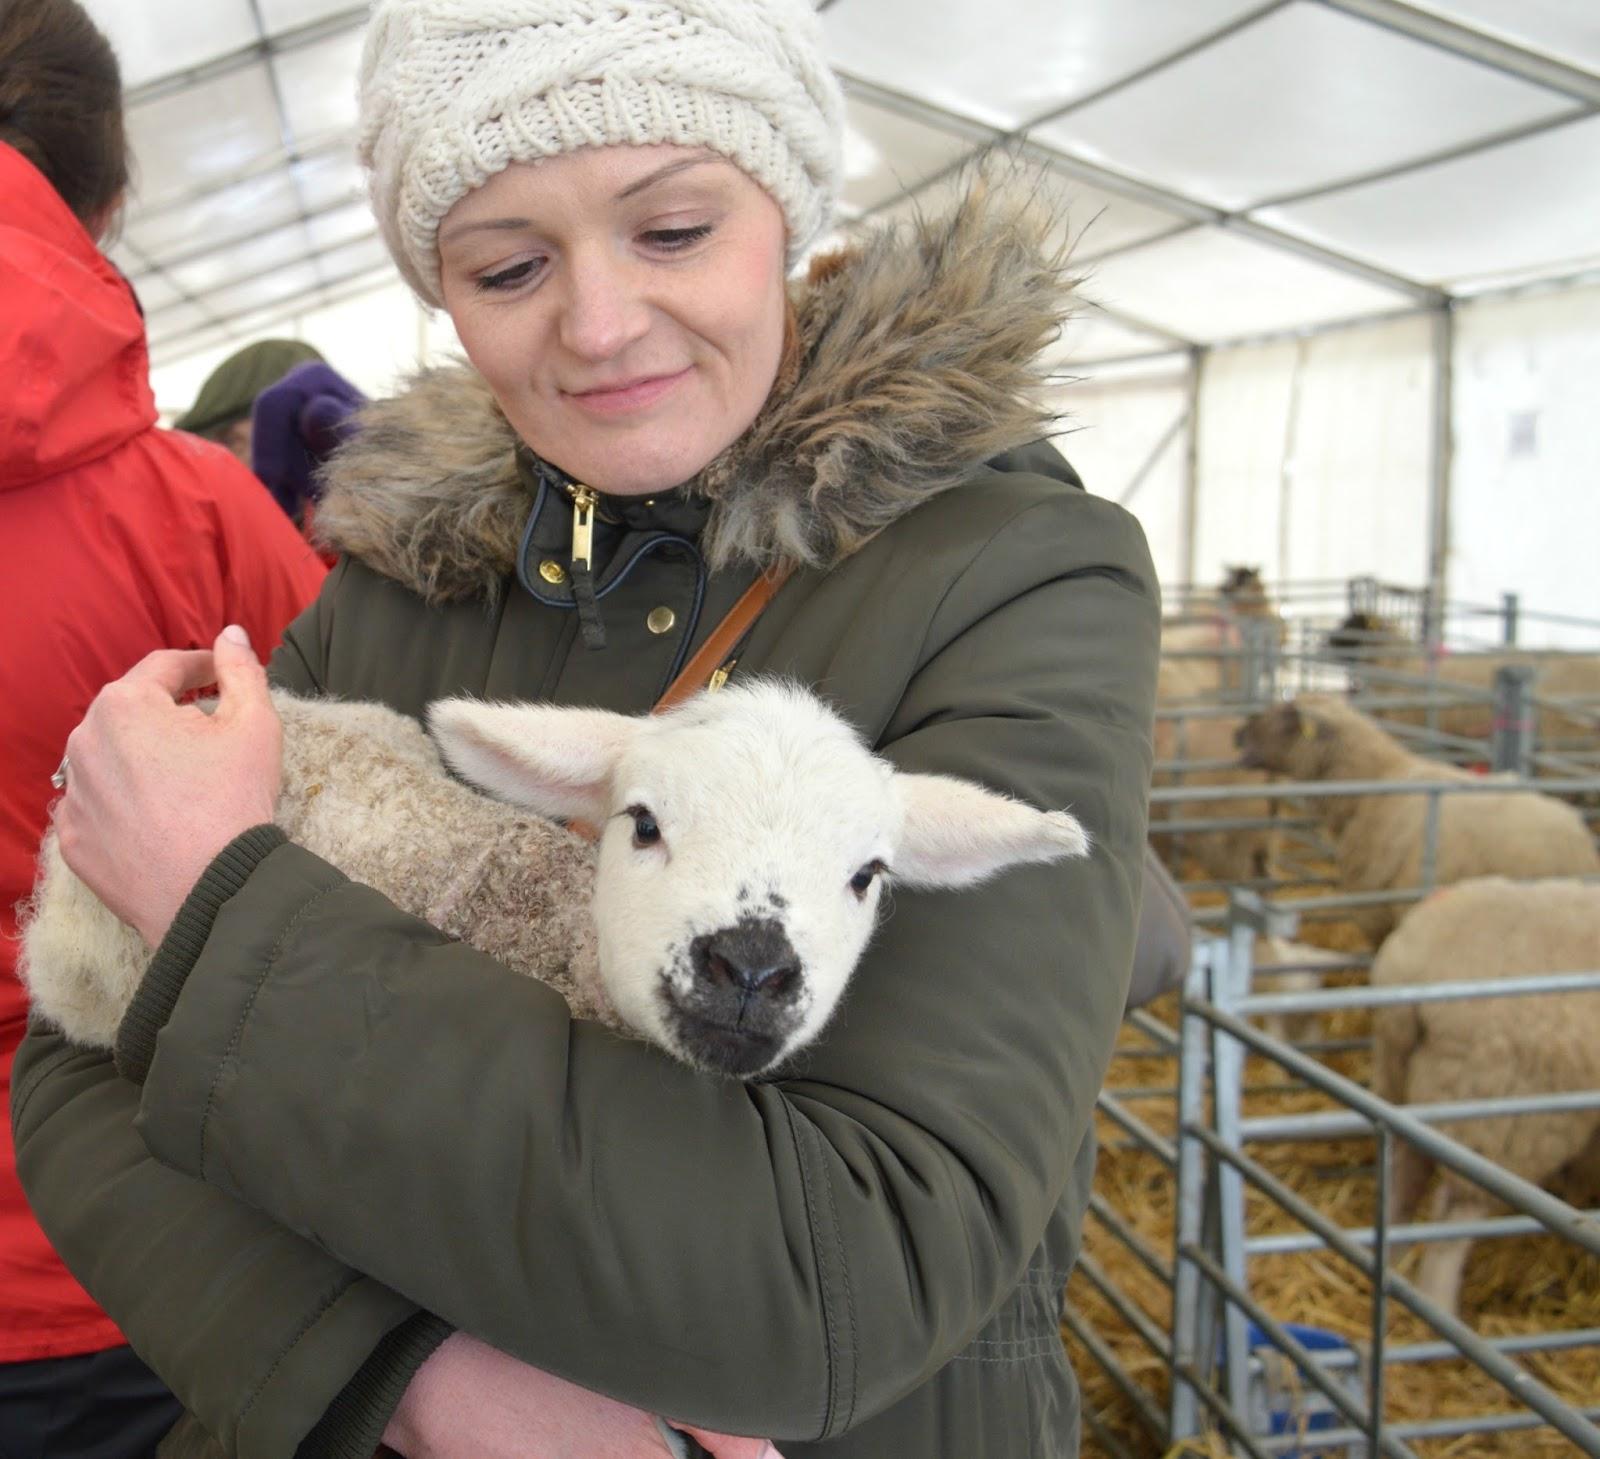 Lambing Live Broomhouse Farm, Northumberland